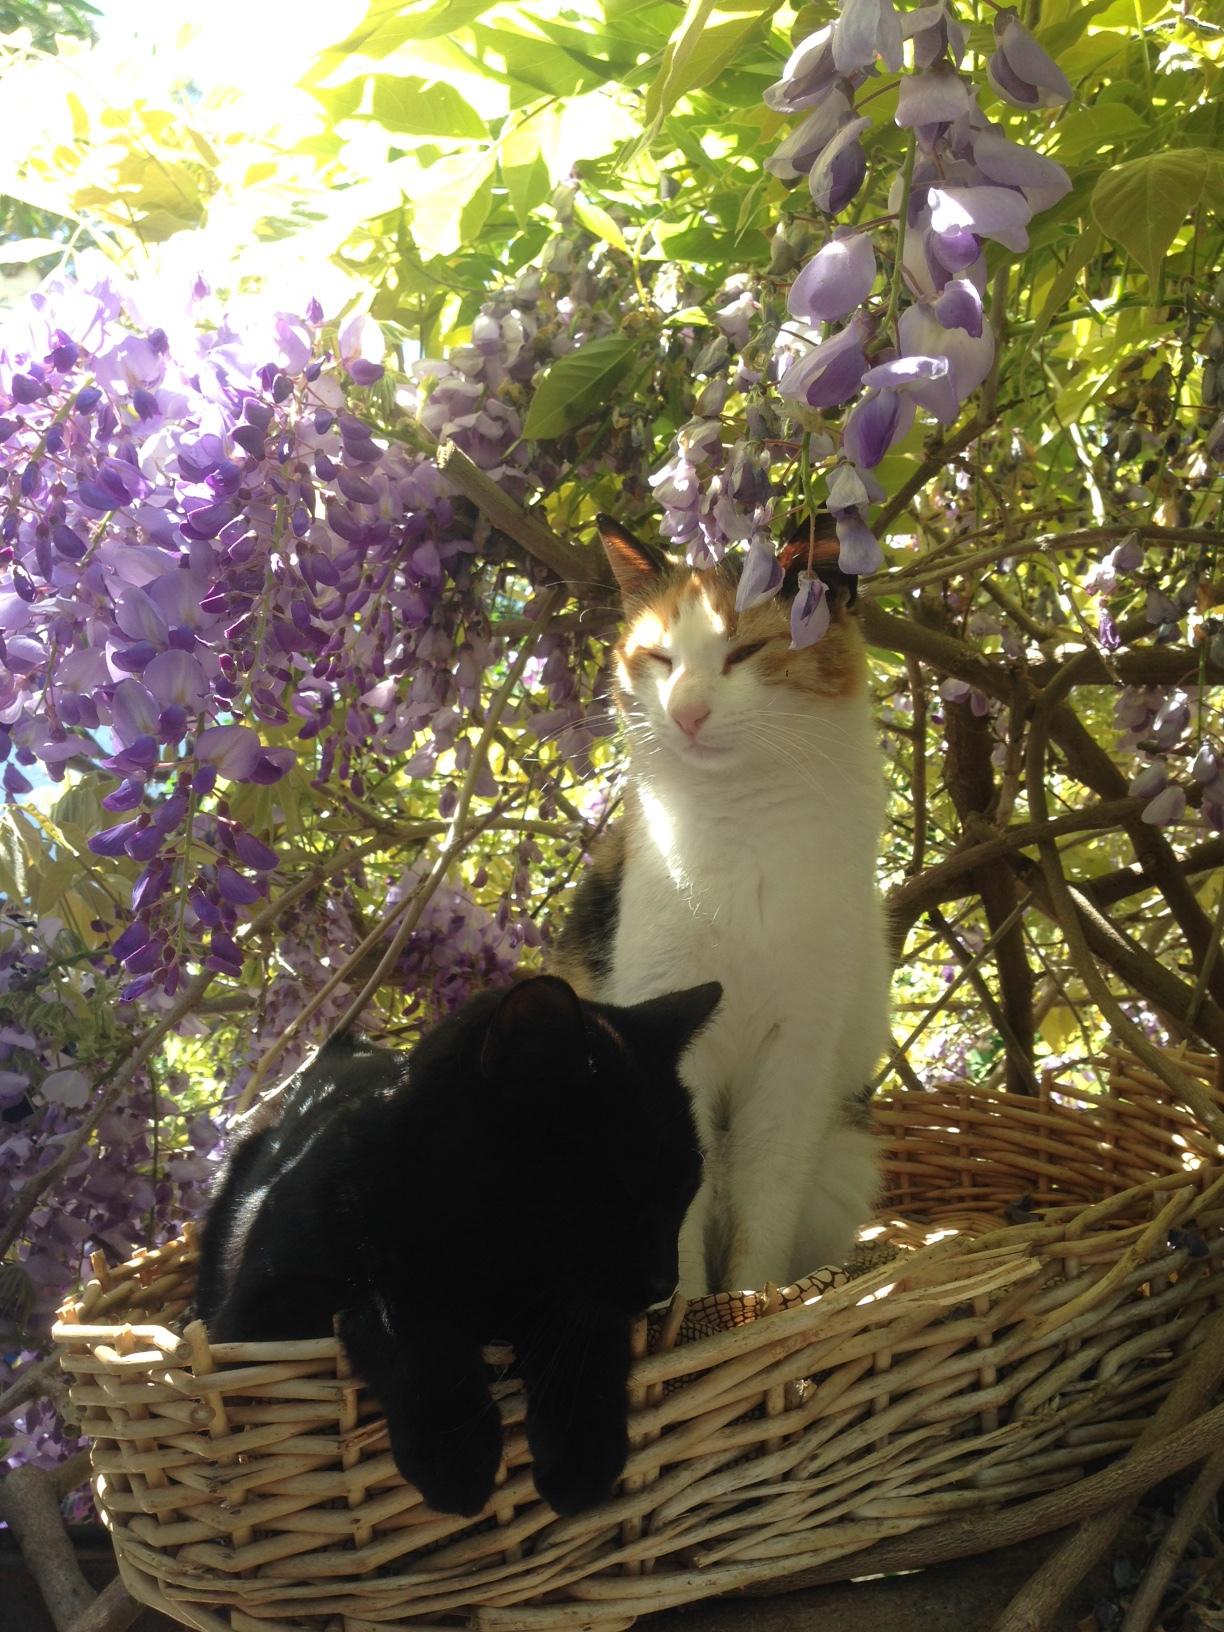 sculpture barcelona cat art service accommodations house rental artists